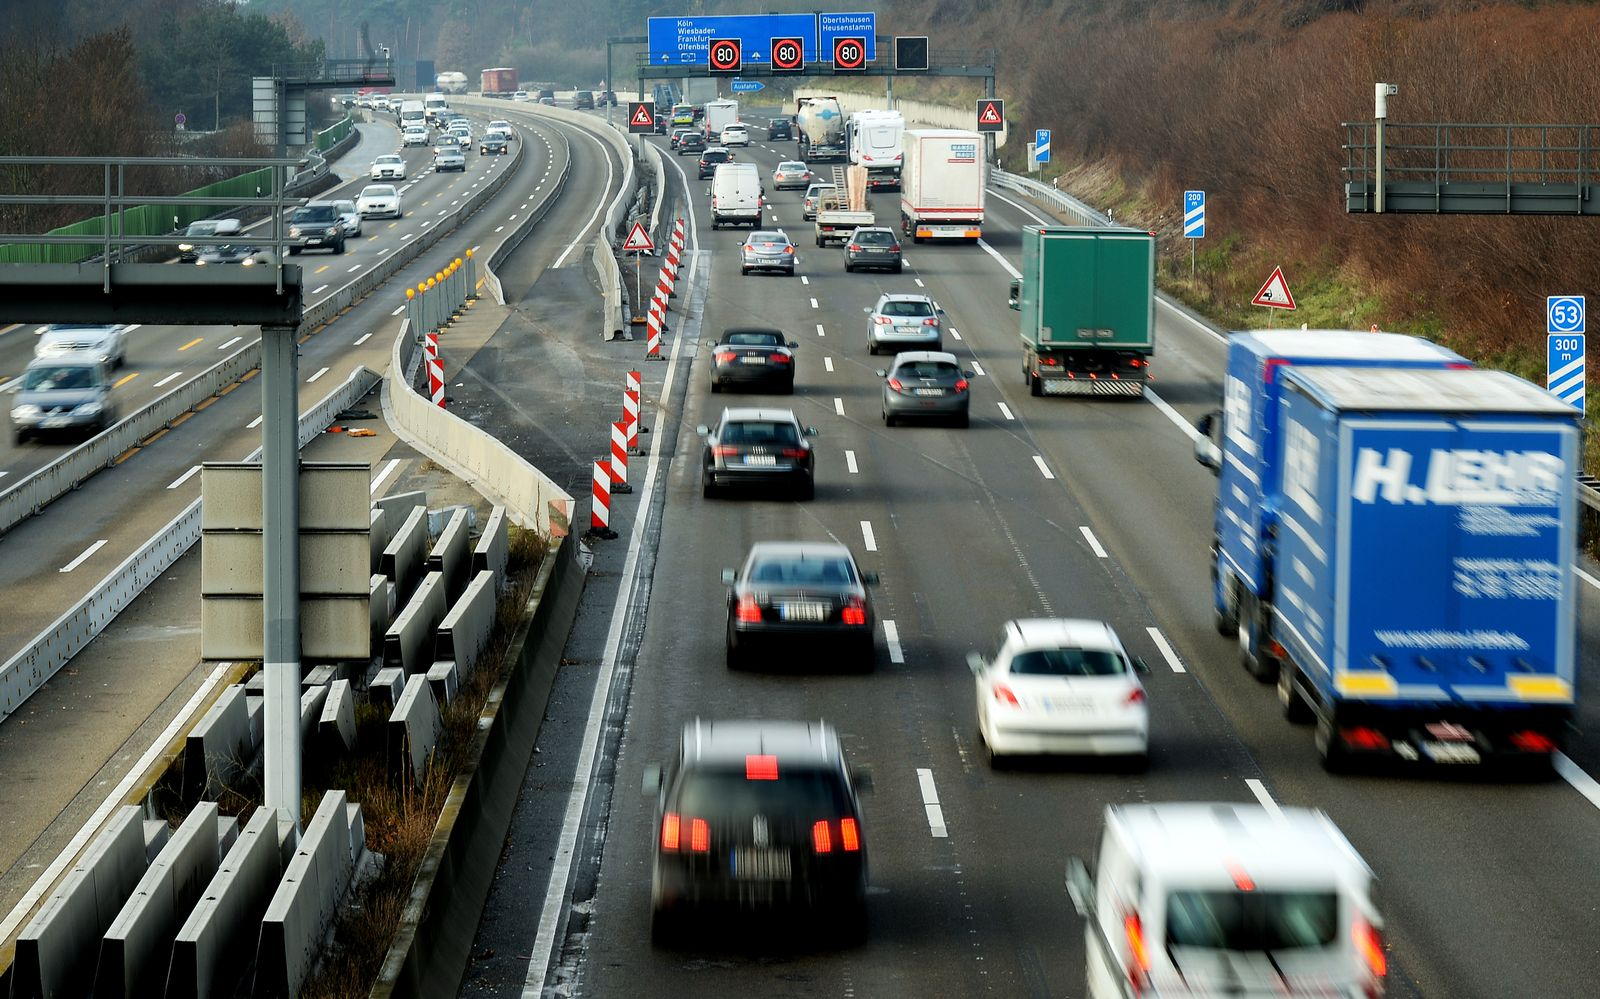 Leer Orte/ Autobahn